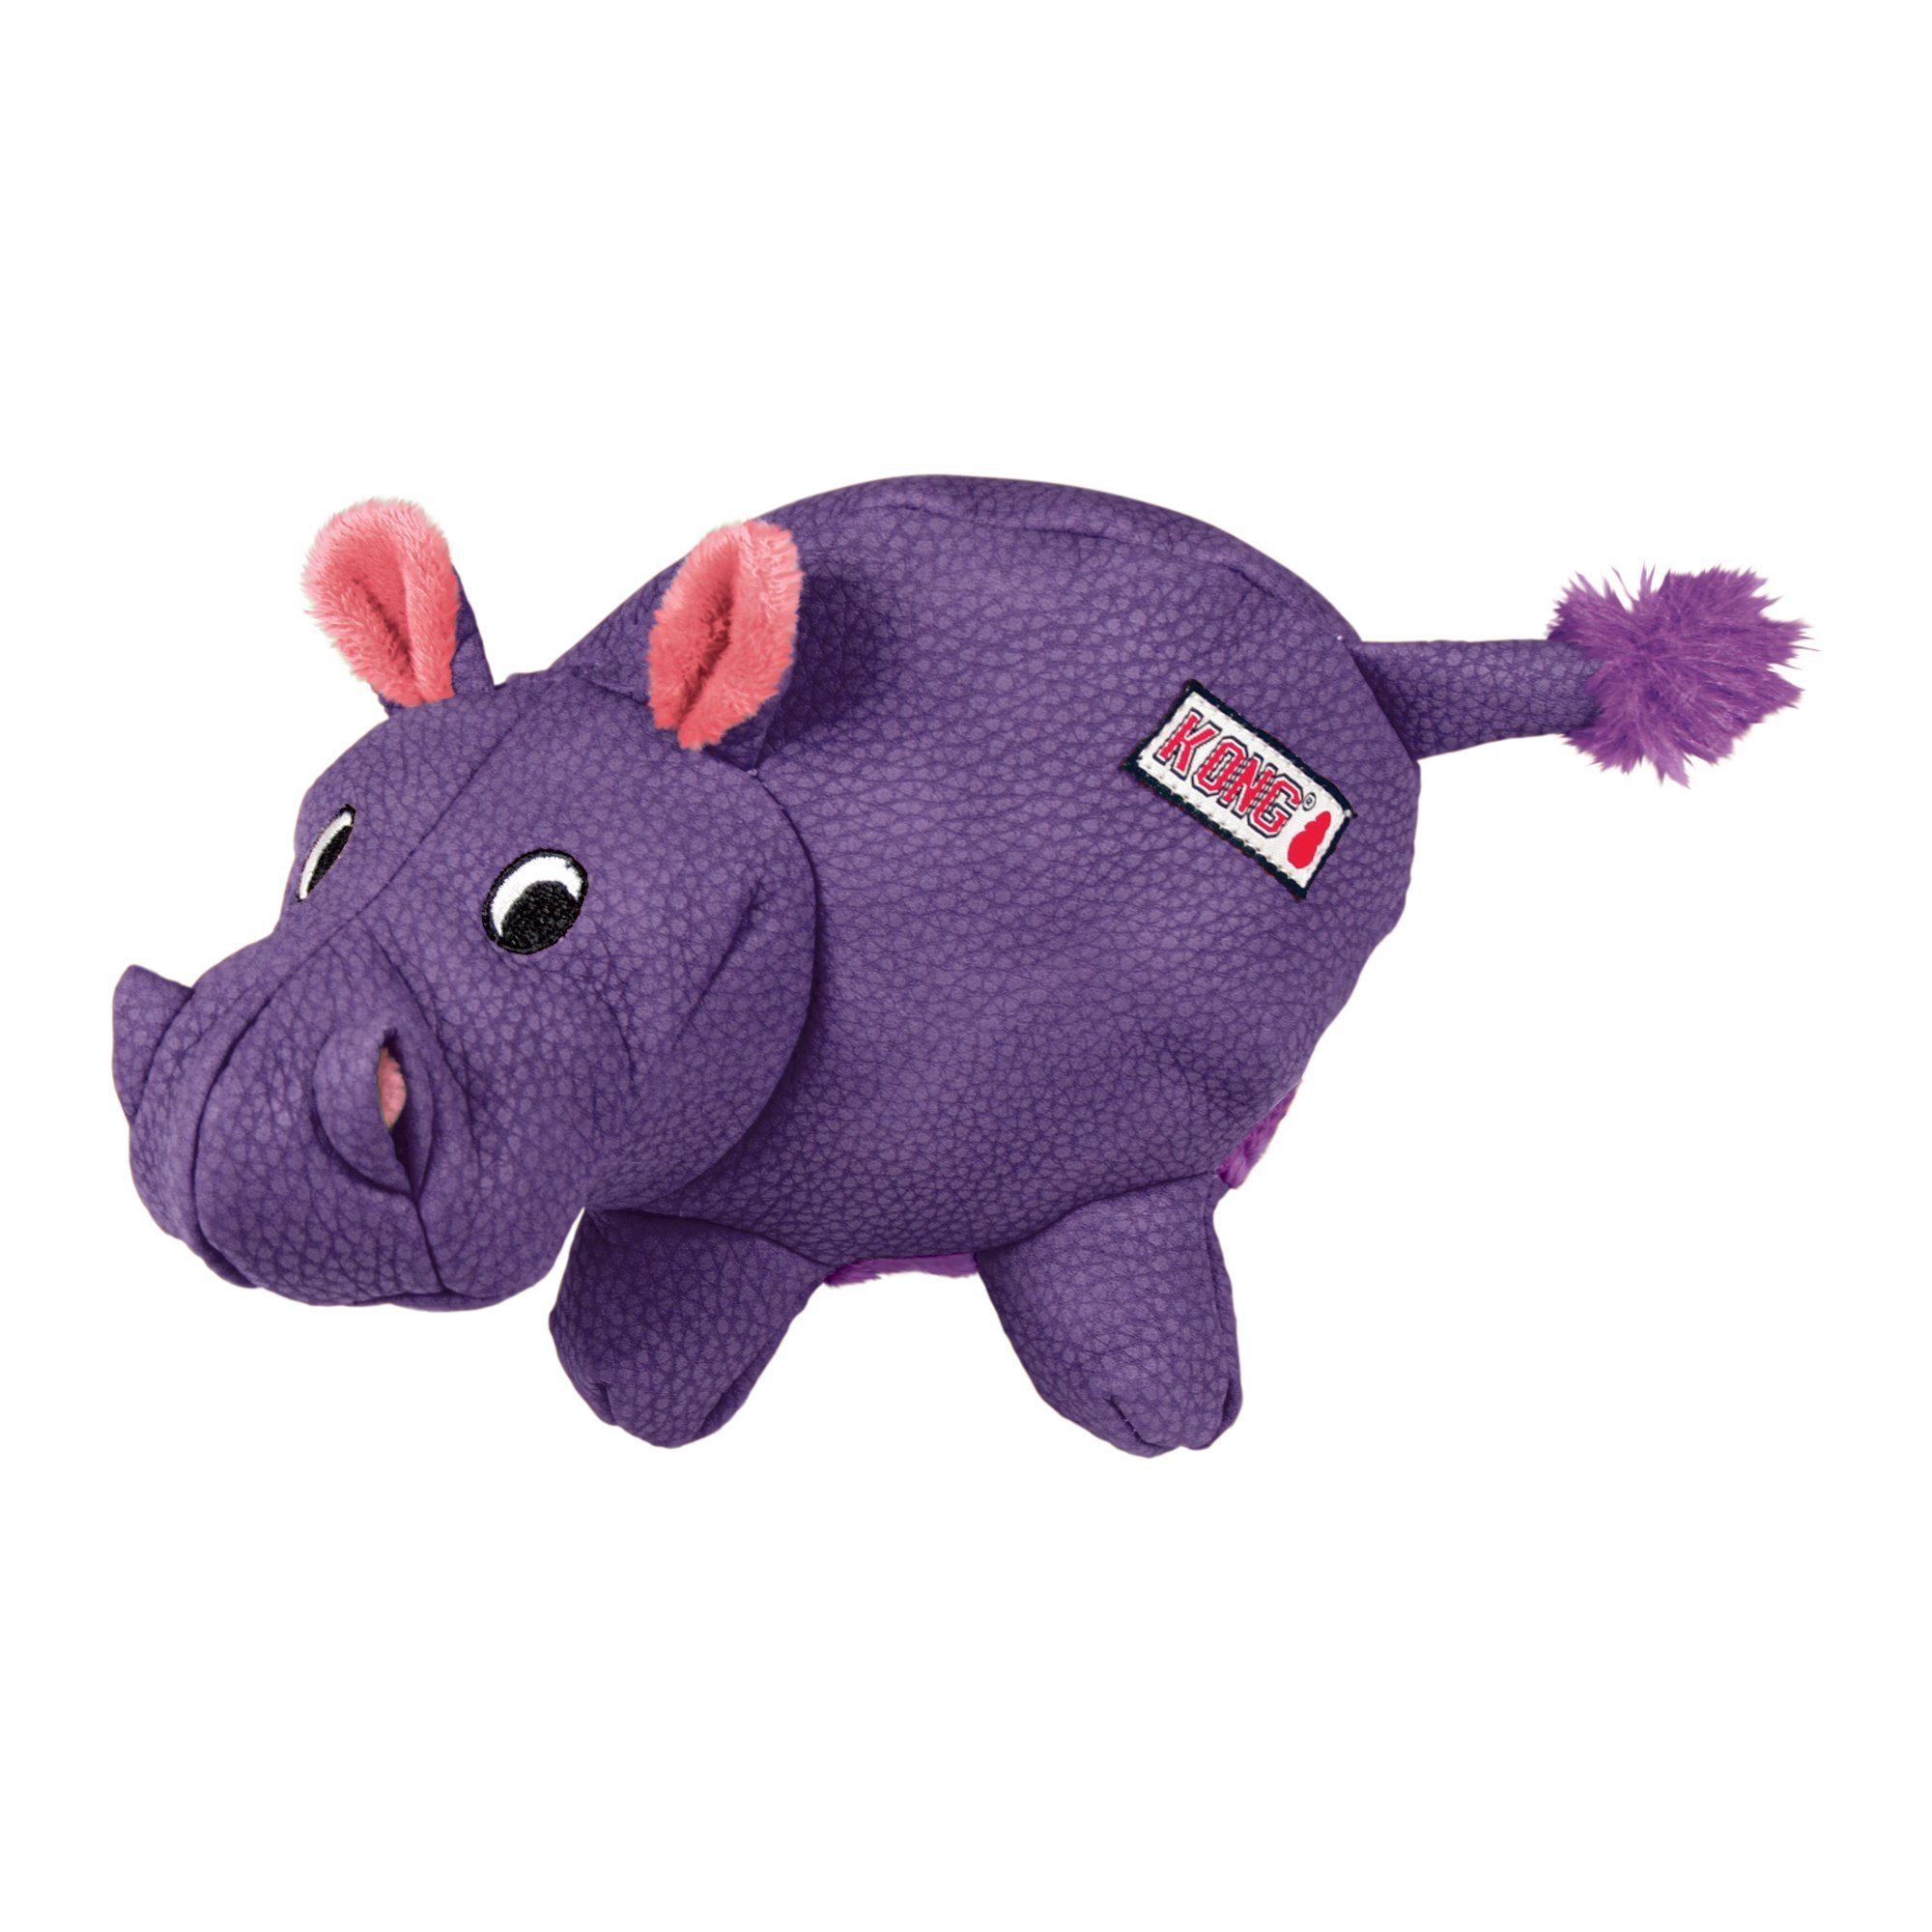 Kong Phatz Hippo Medium Purple Dog Toys Toy Puppies Smart